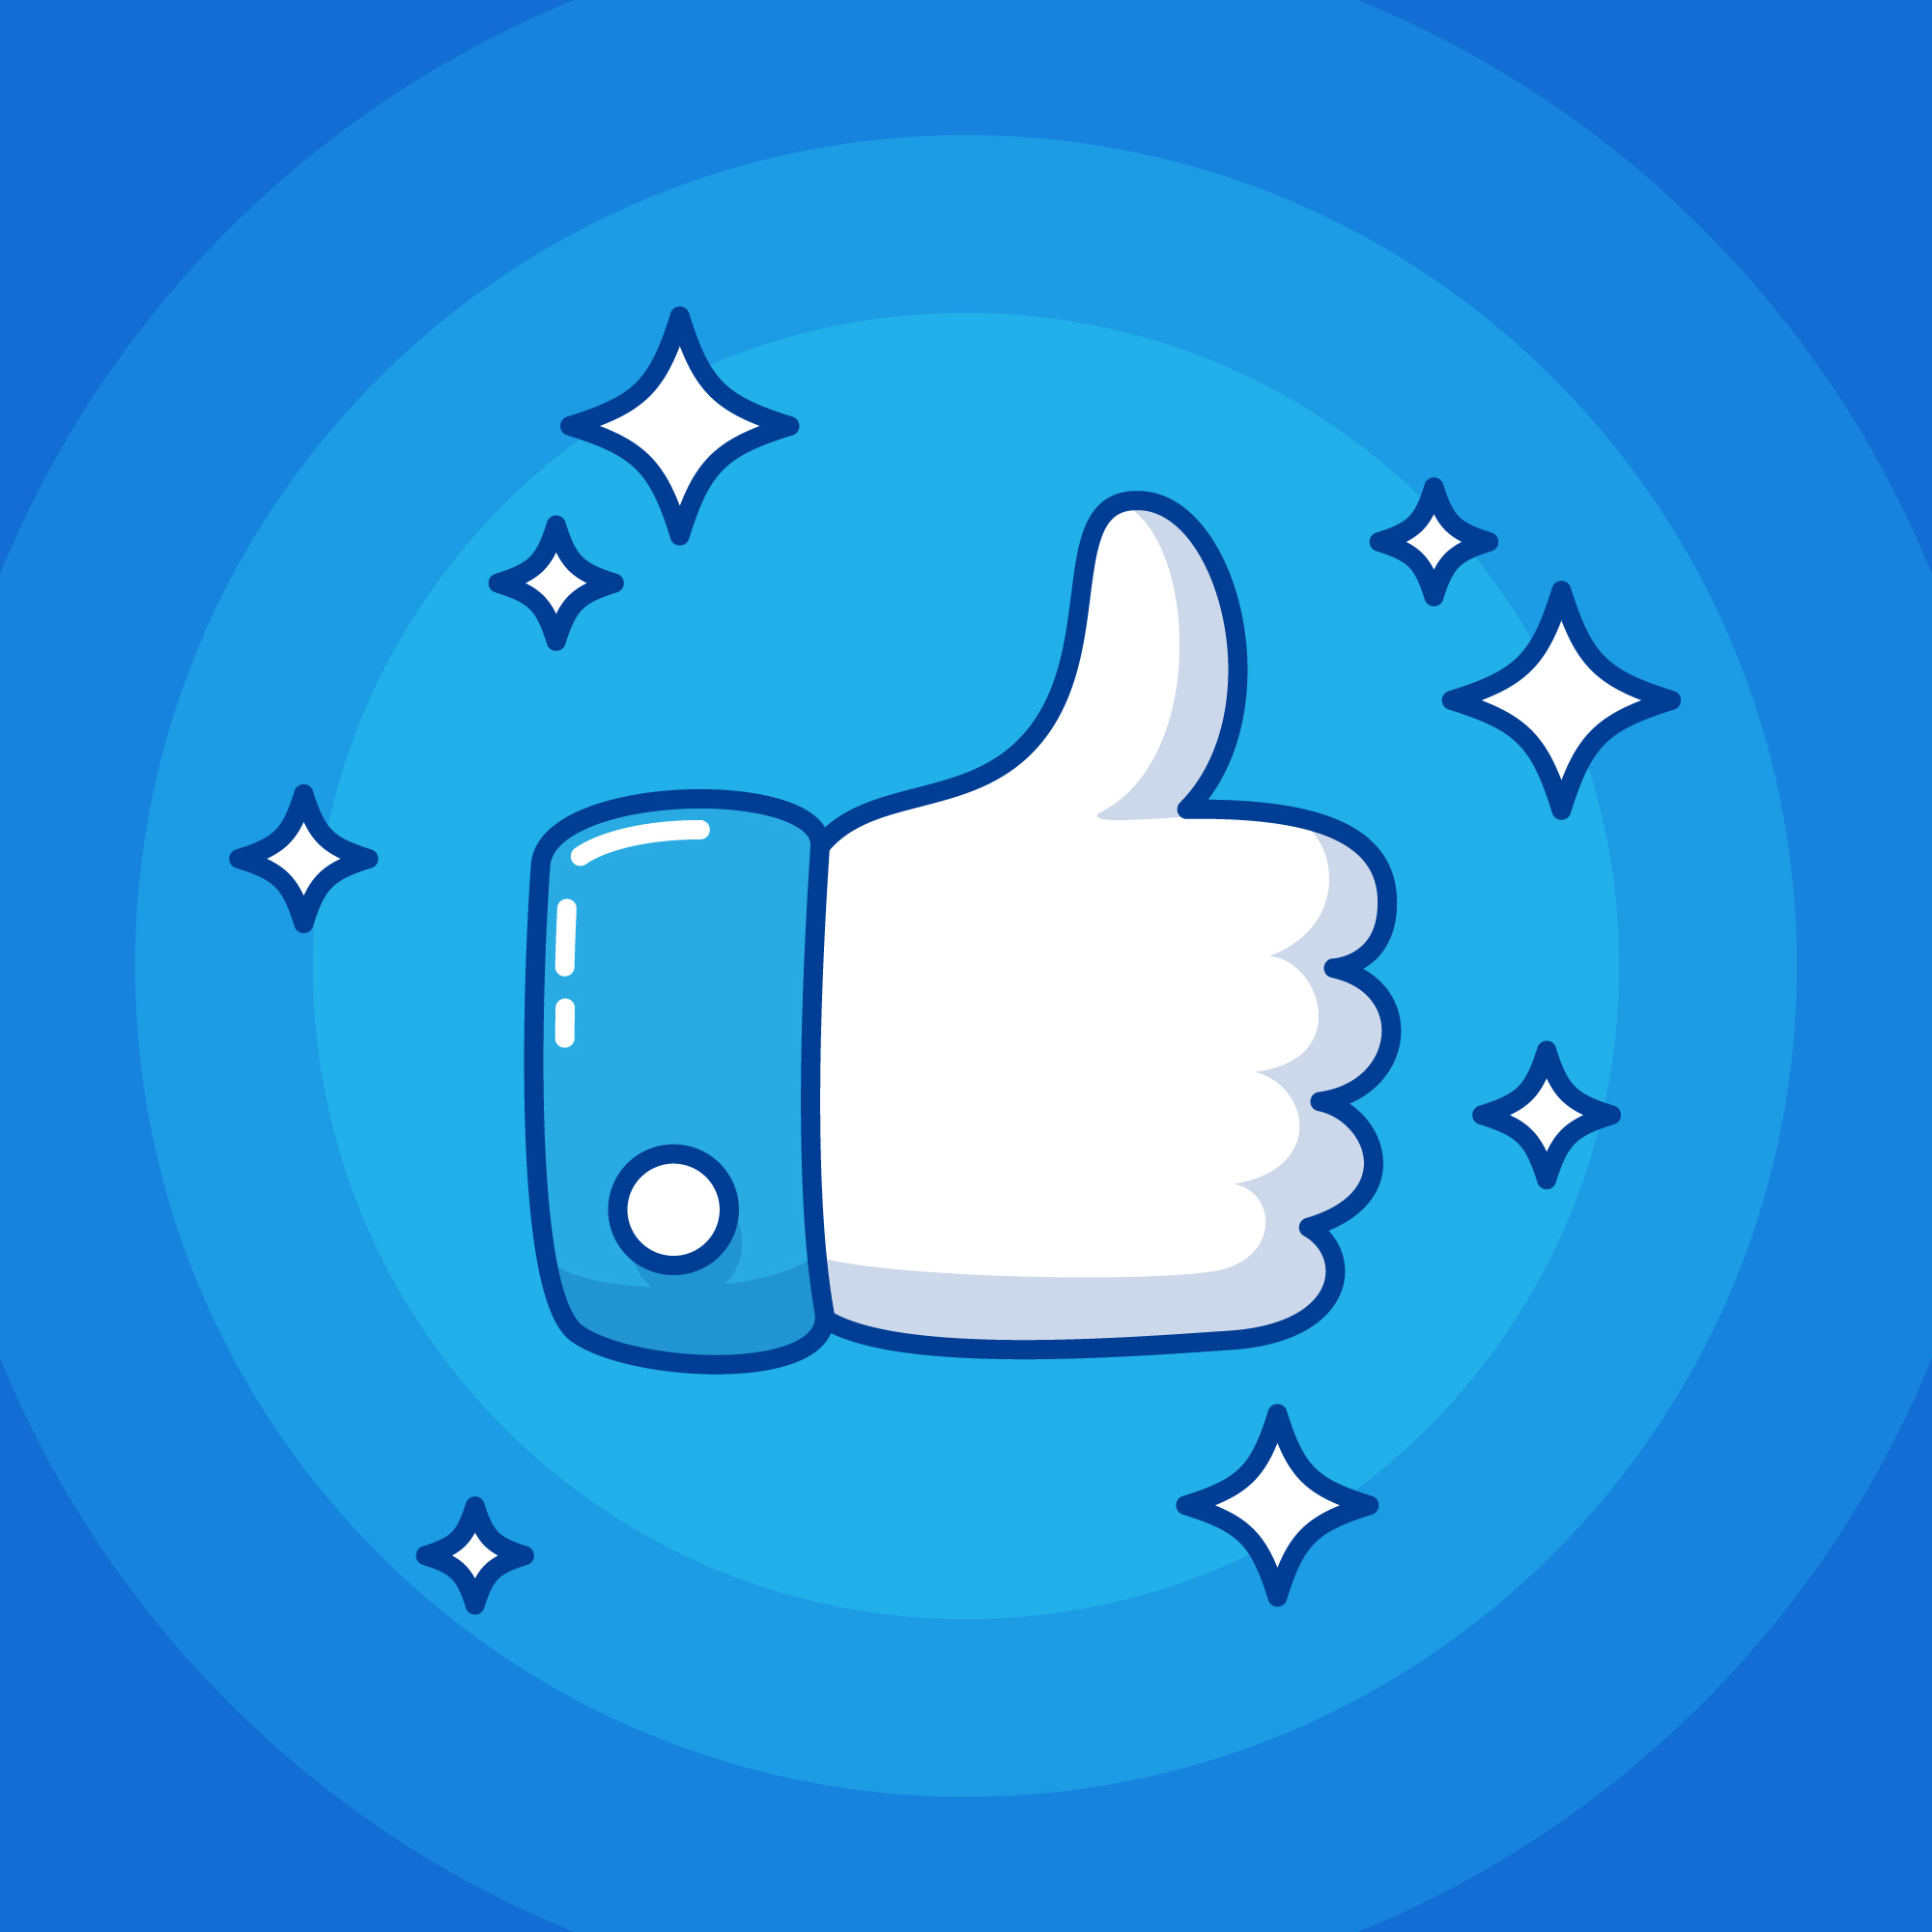 metody na darmowe lajki na fb